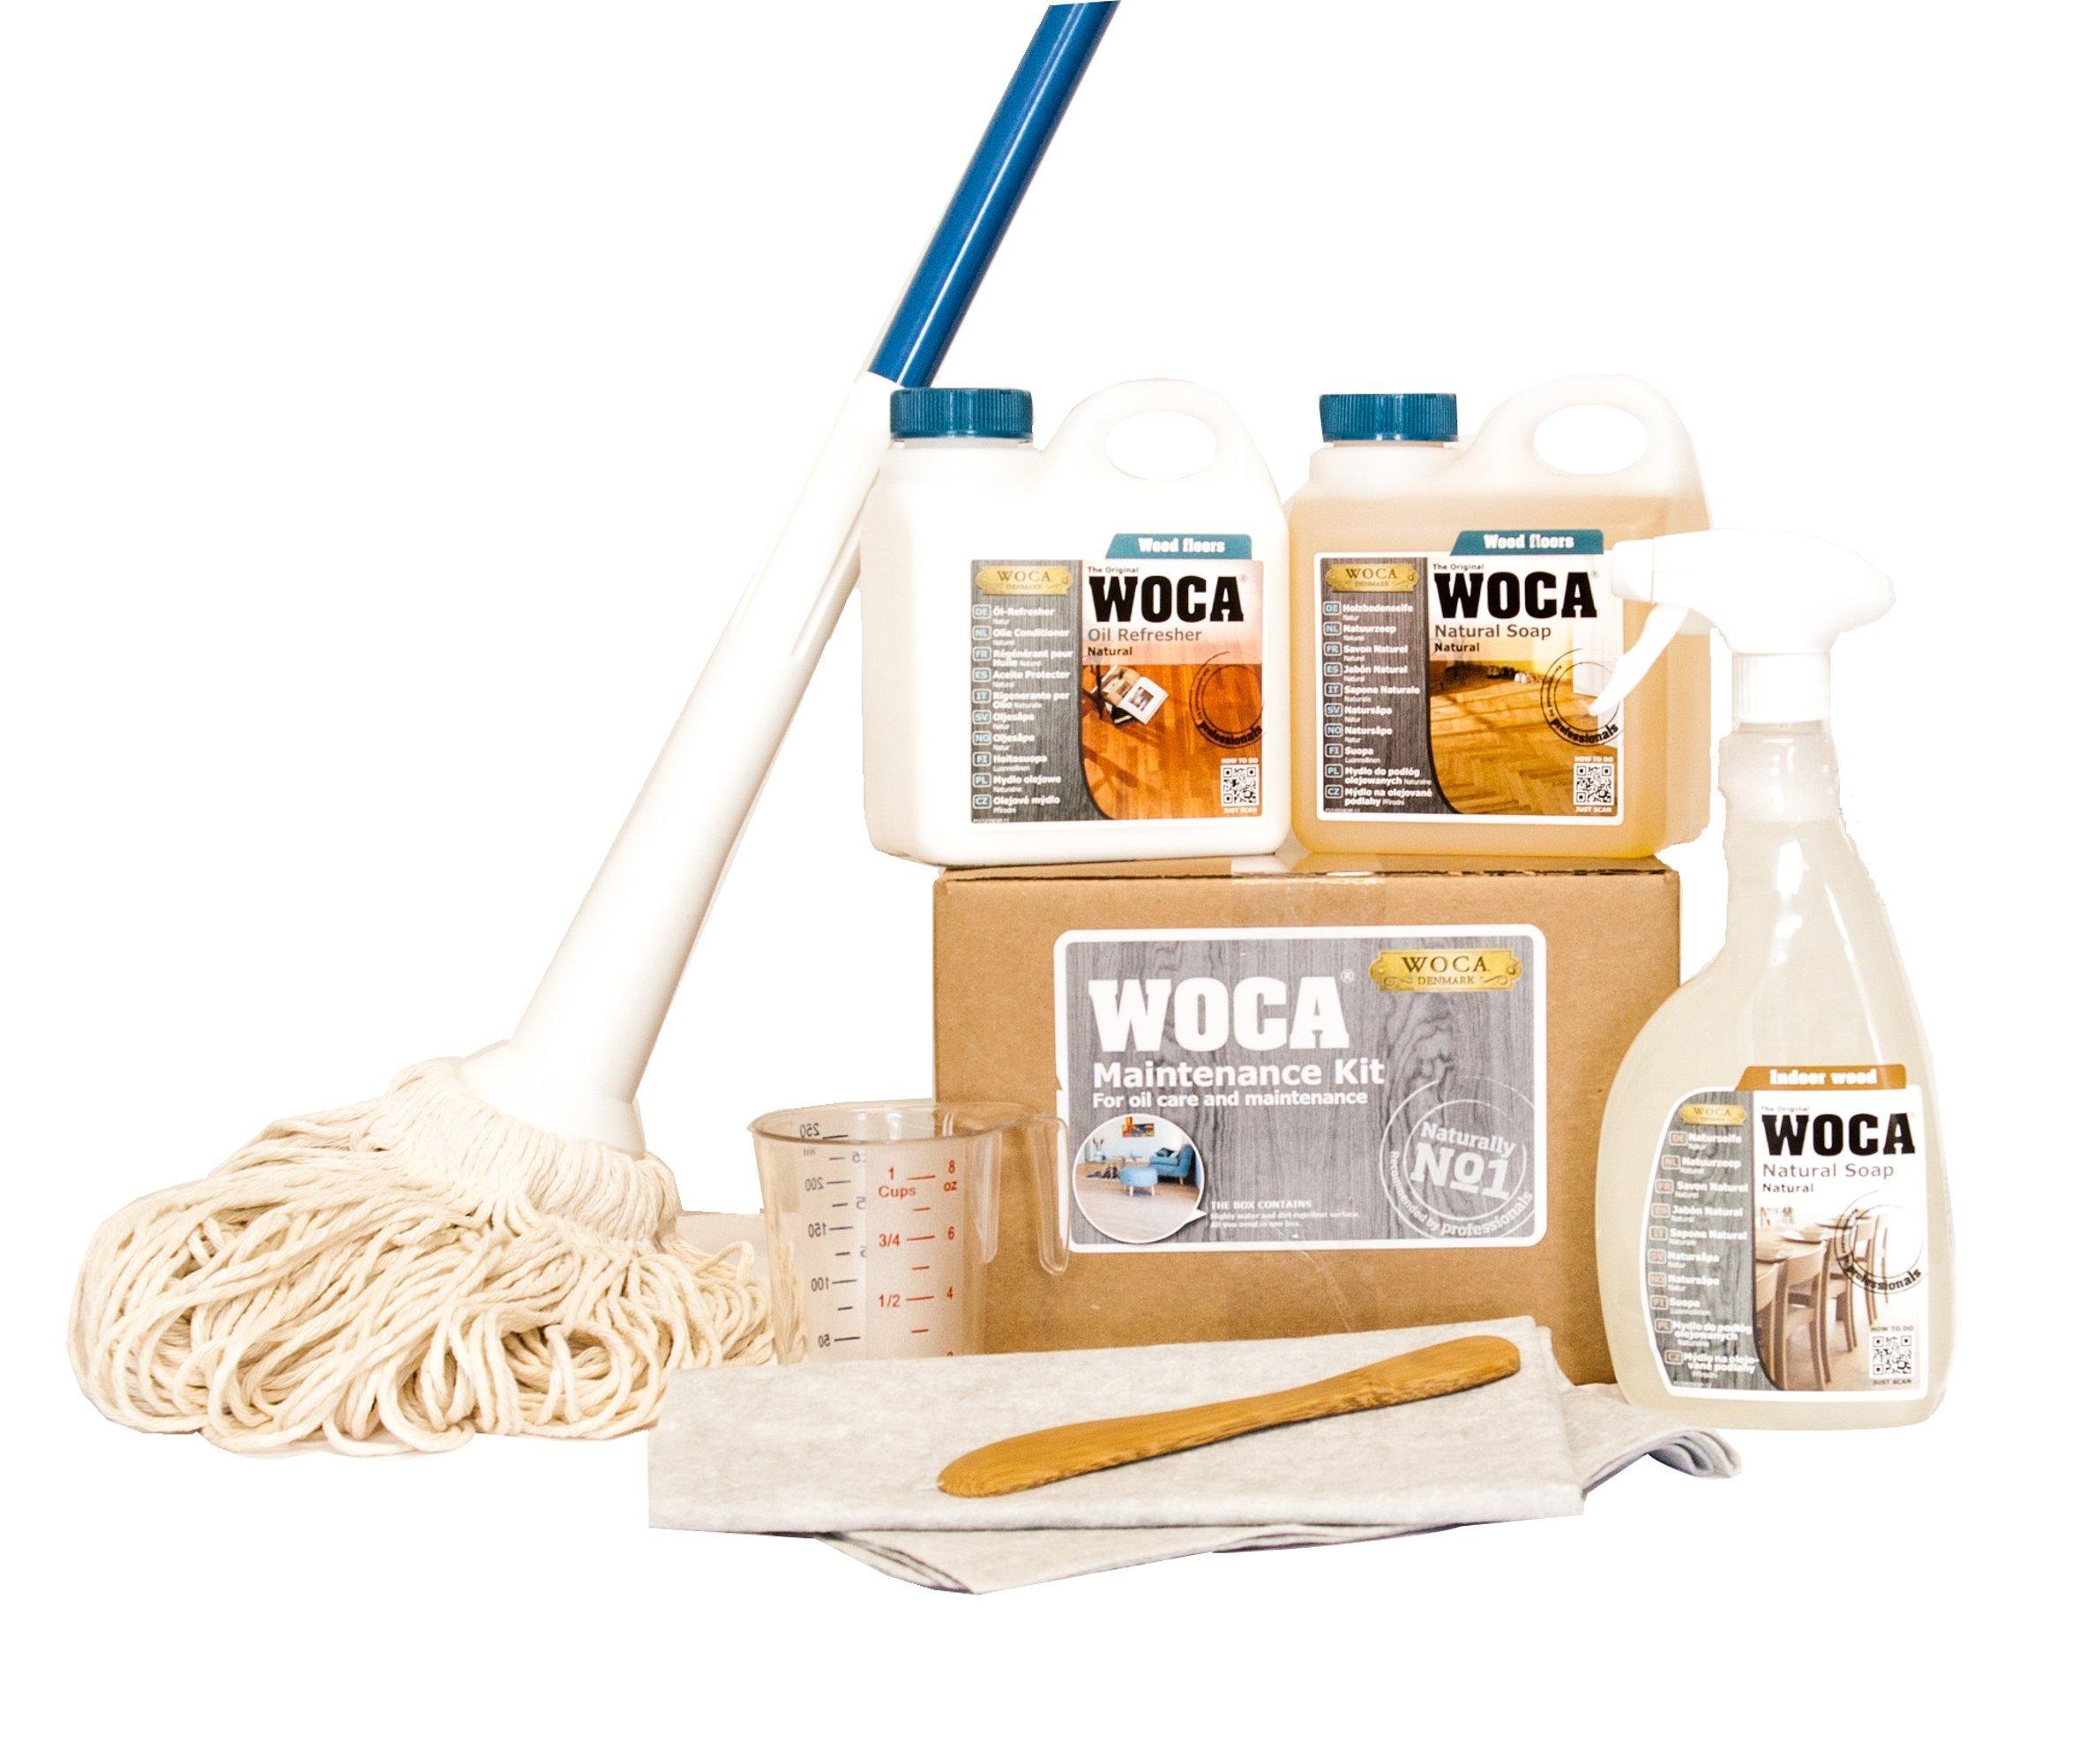 Woca Premiere Kit (Natural) by WOCA Denmark